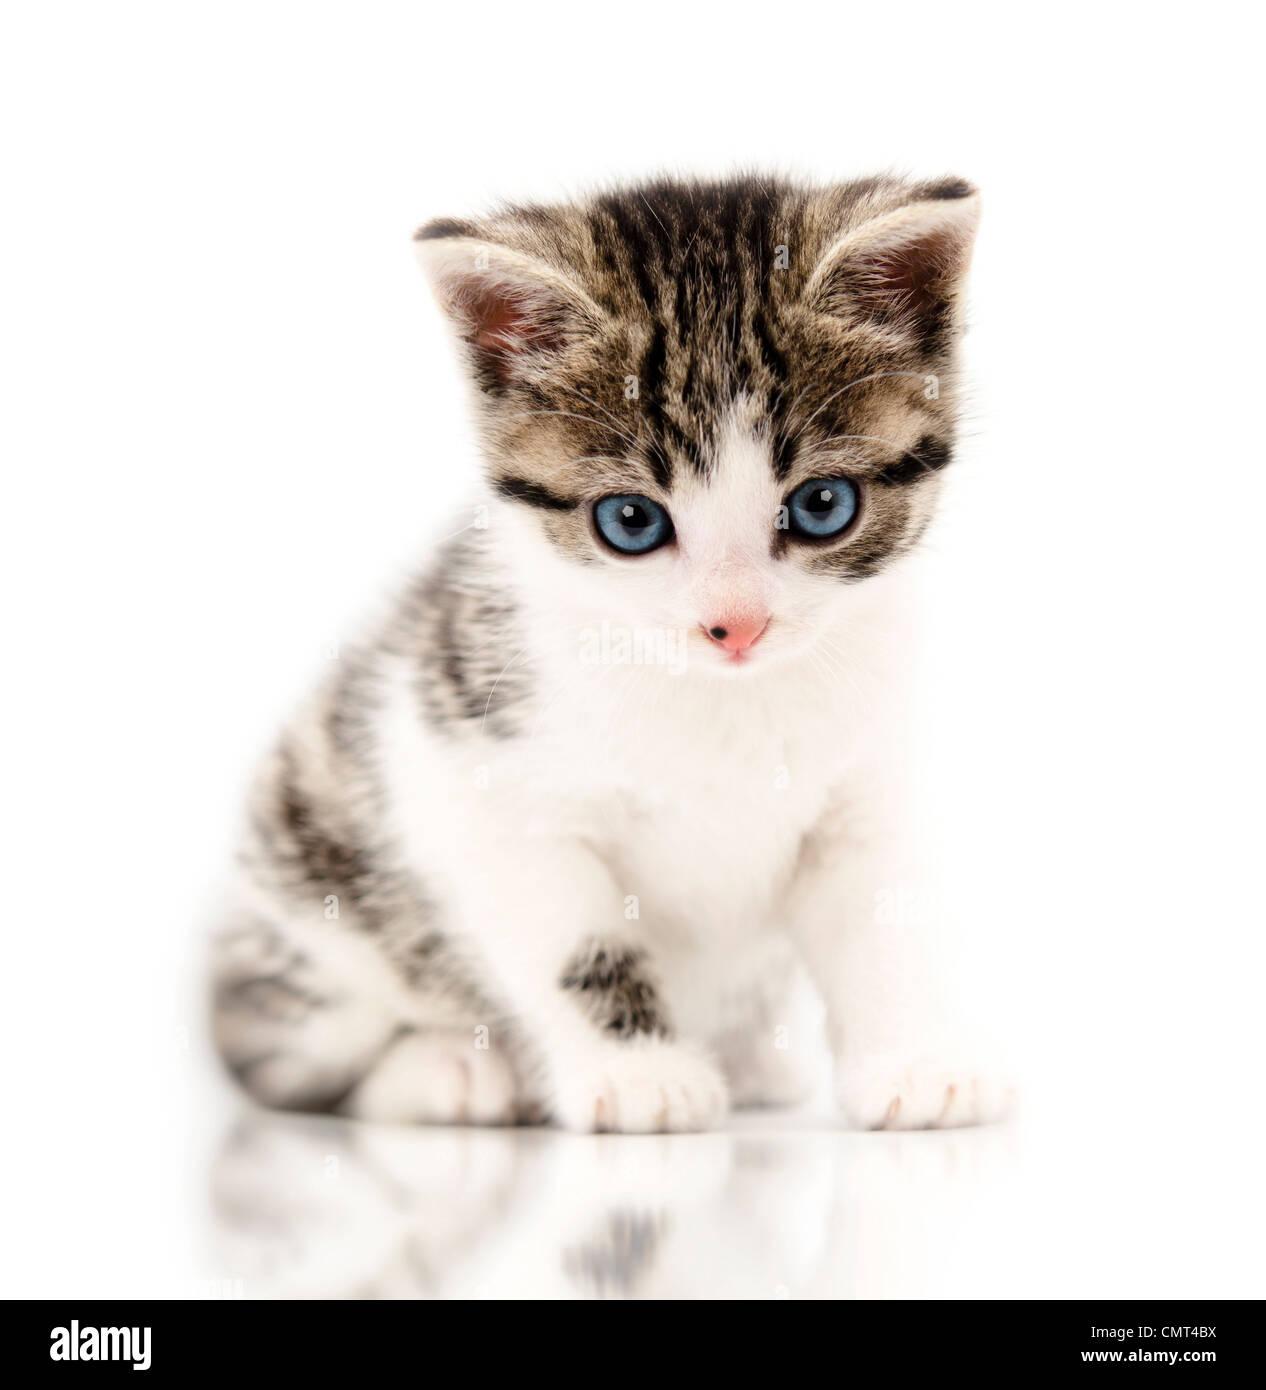 Pequeño gatito en un gracioso plantean Imagen De Stock